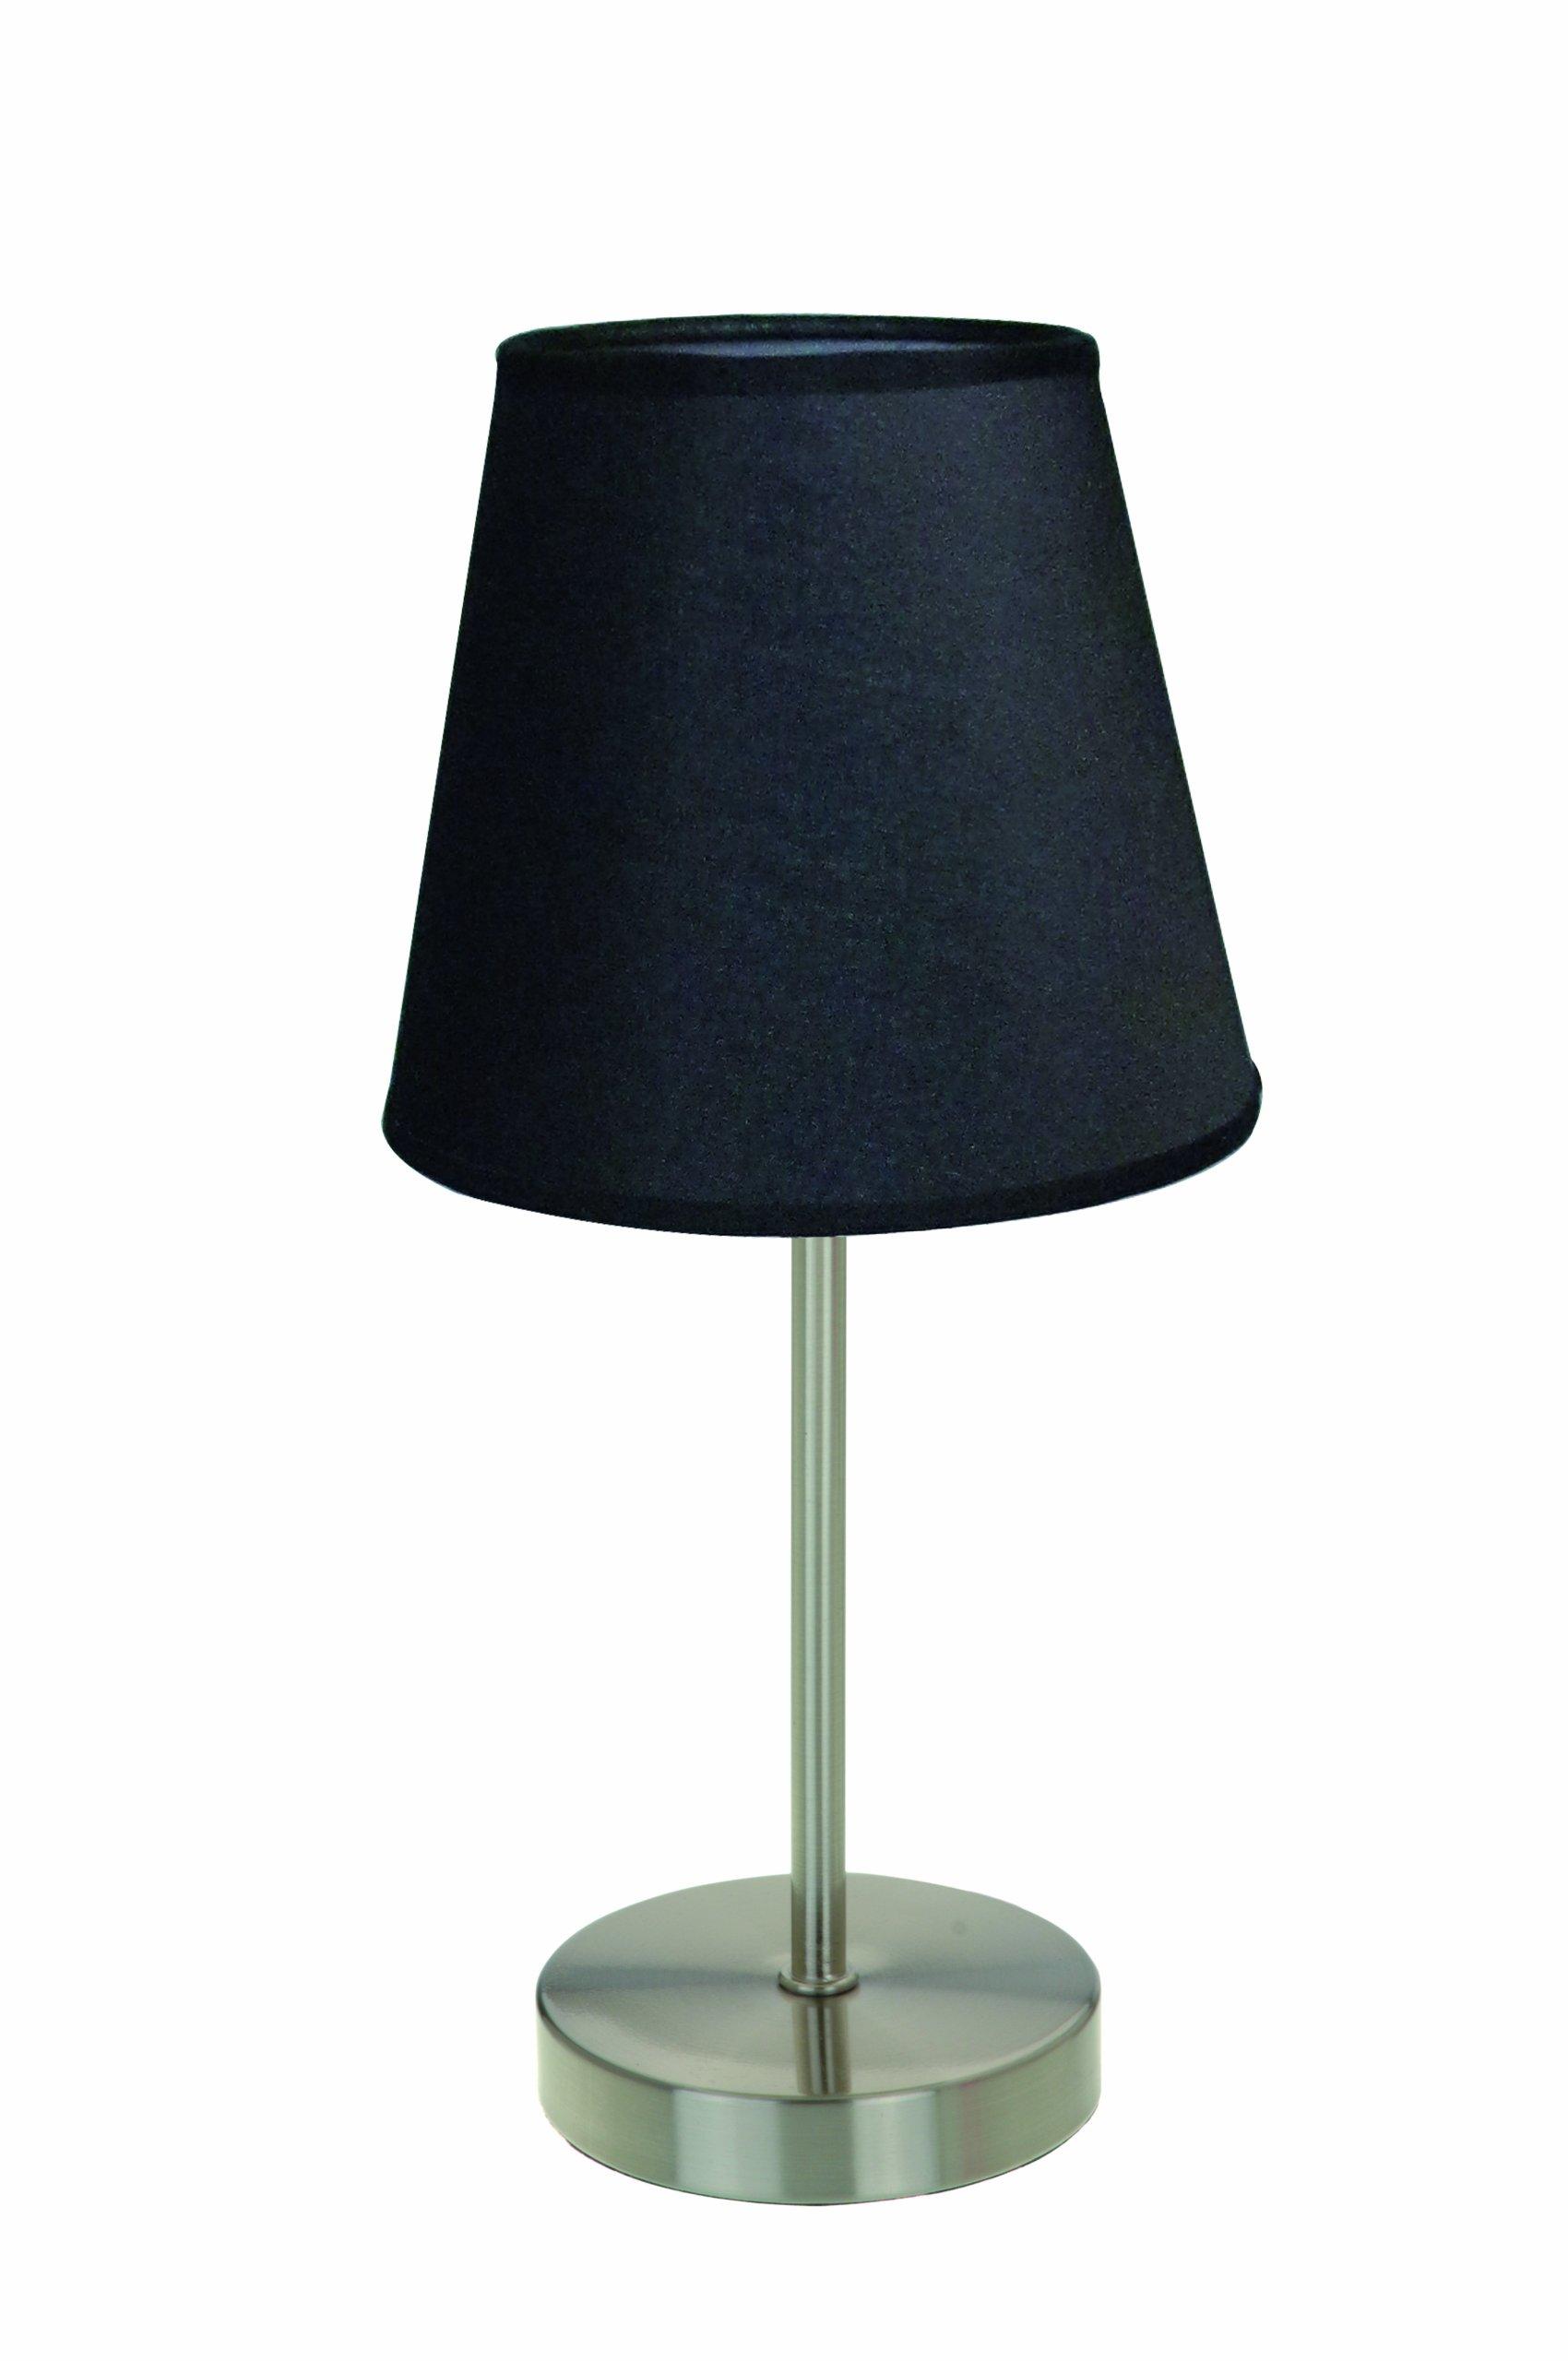 Mini table lamp kids room living room lamp small home - Black lamp tables for living room ...